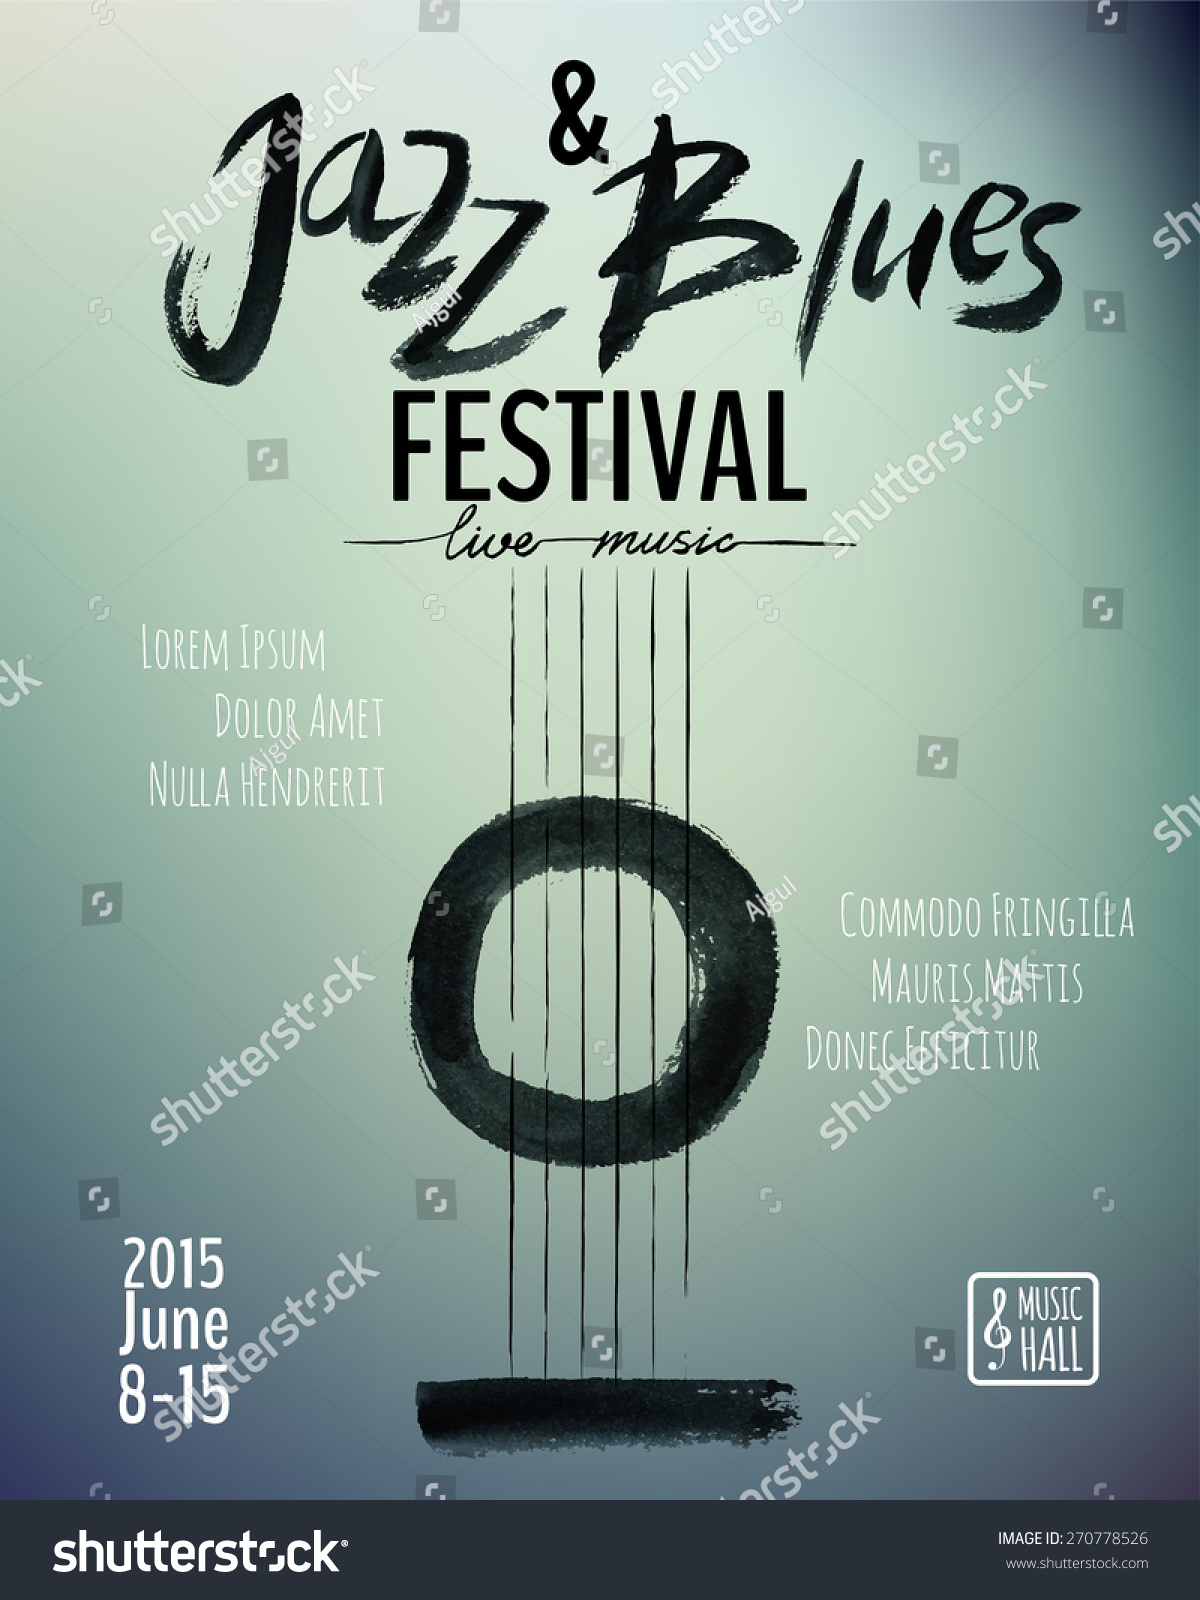 jazz blues music festival poster background stock vector